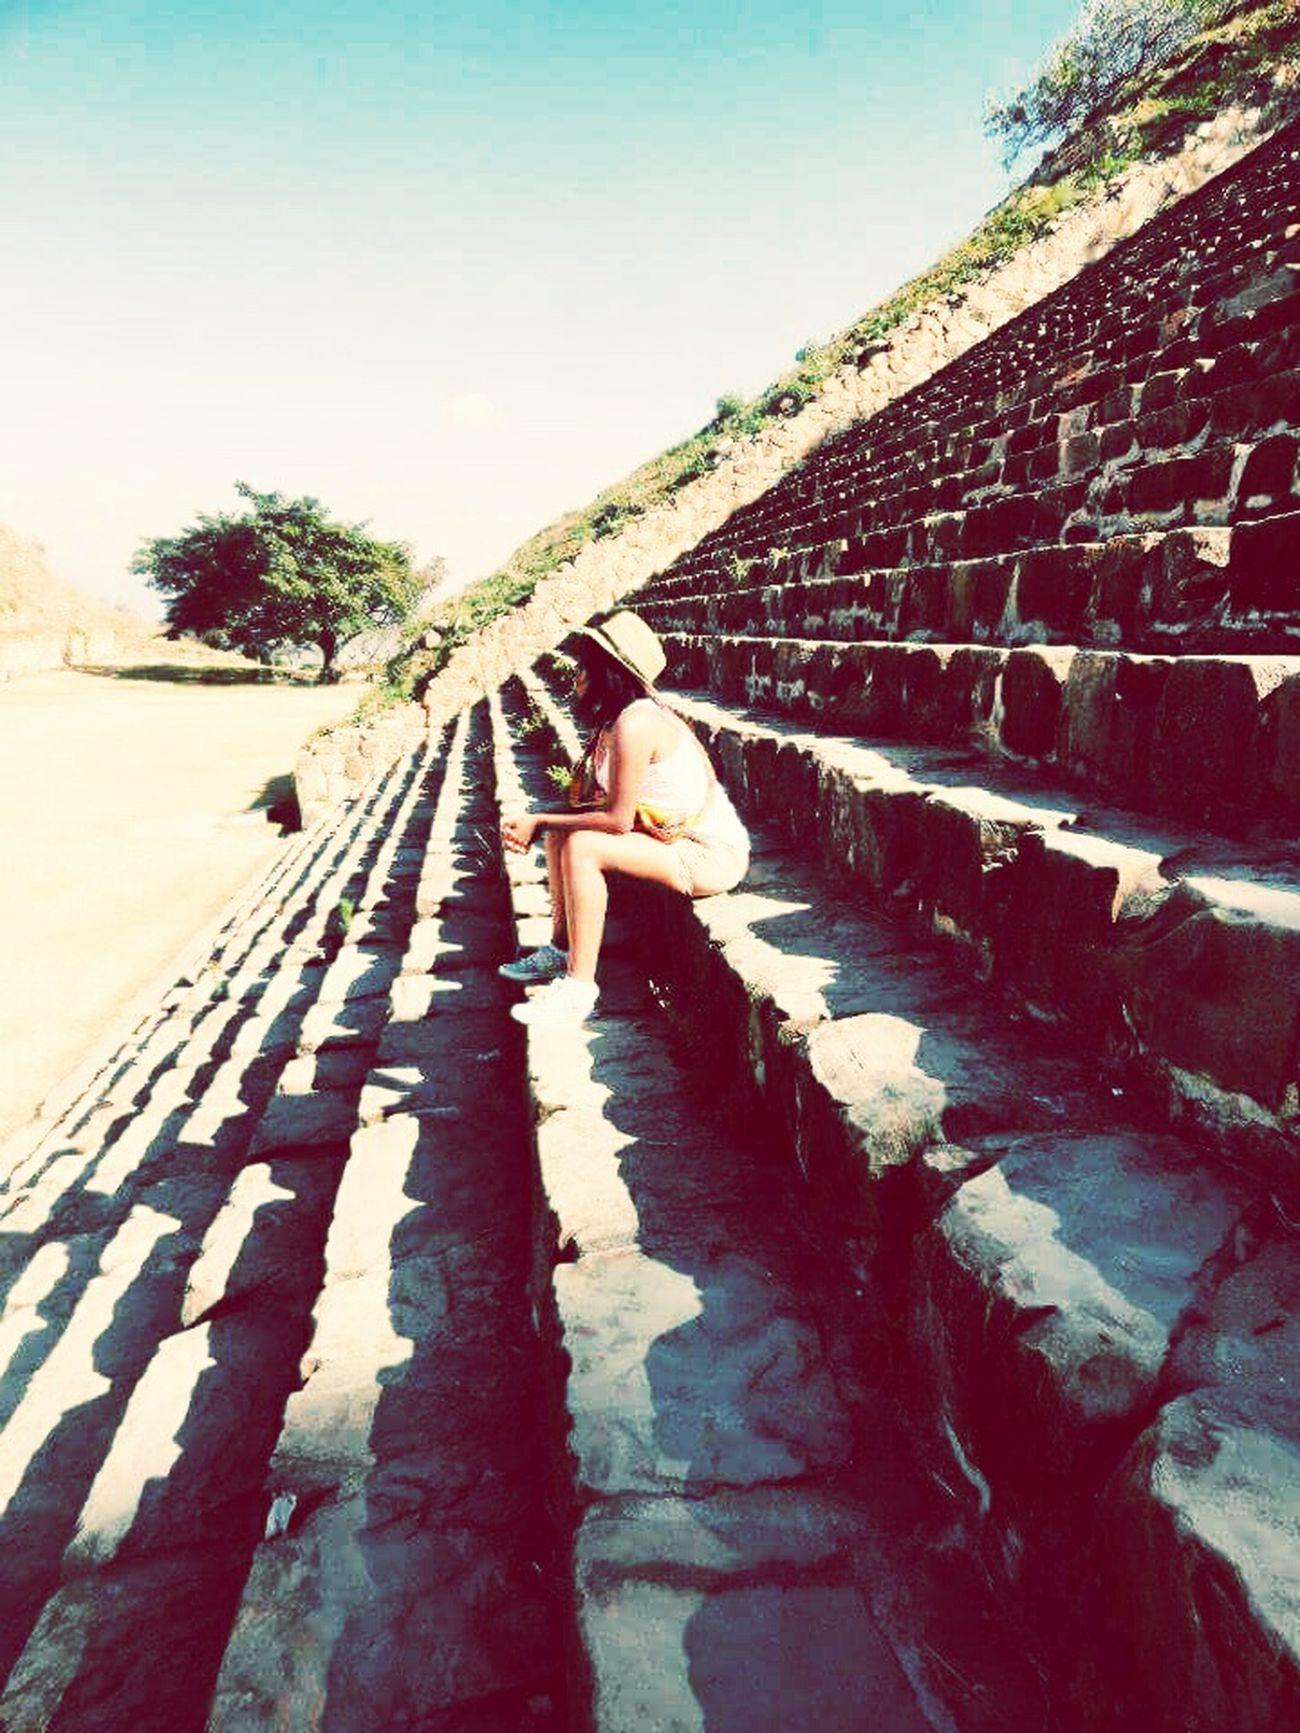 Wendy Oaxaca De Juárez Monte Alban EyeEm Best Shots - Nature EyeEm Nature Lover